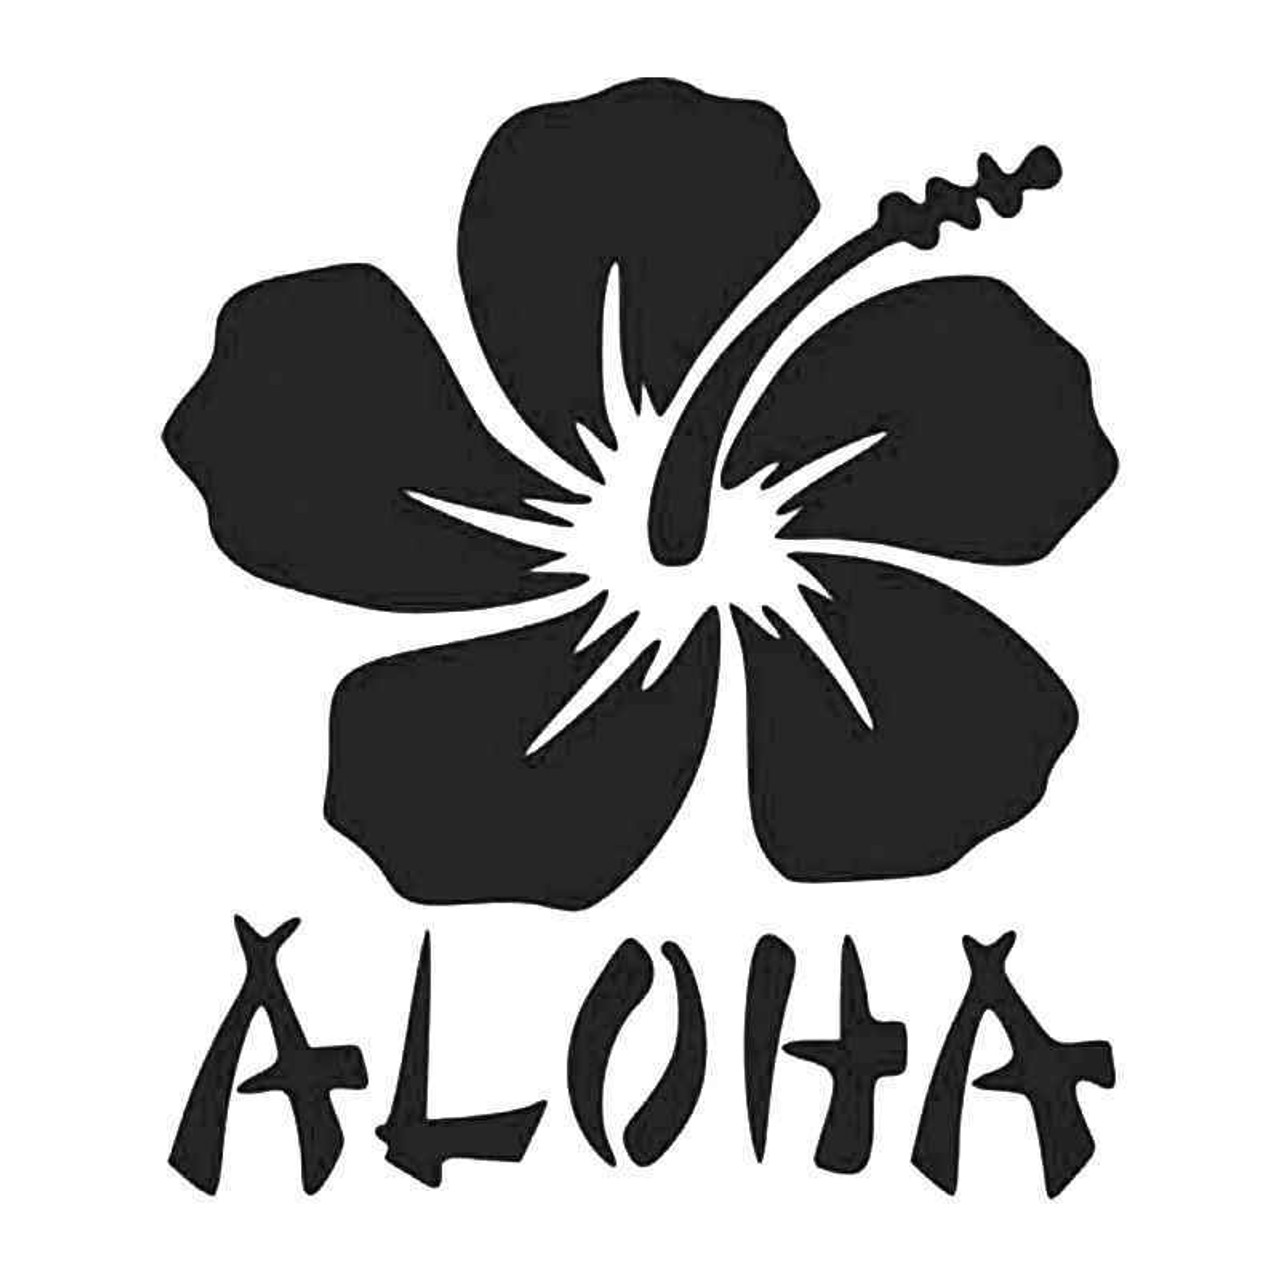 Hawaii Hibiscus Flower Sticker Aloha S8 all chrome and regular vinyl colors